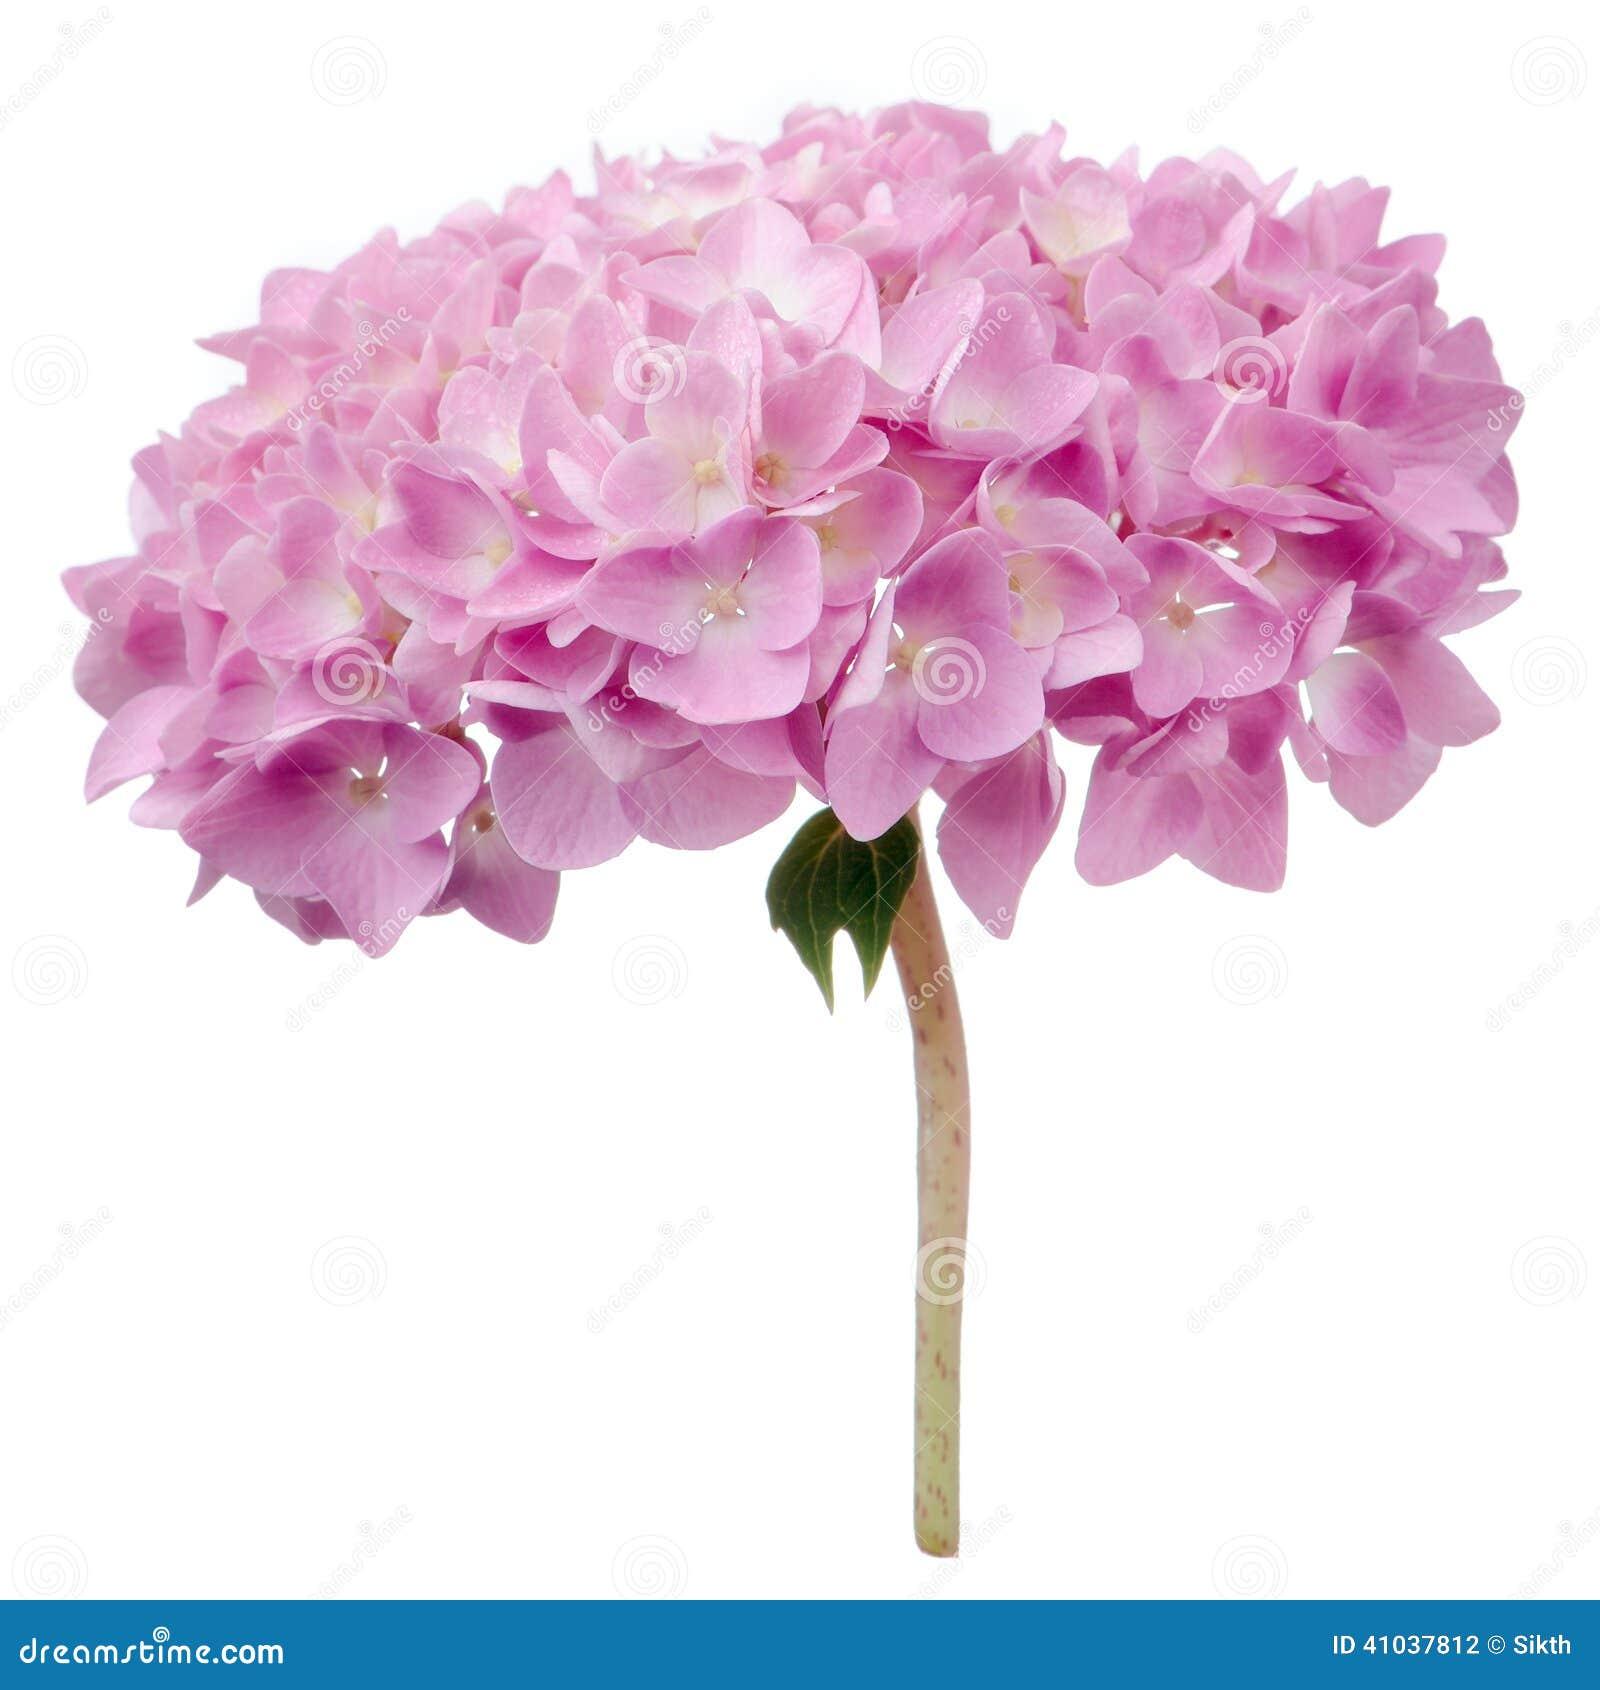 Pink Hydrangea Flowers Isolated On White Background Stock Photo